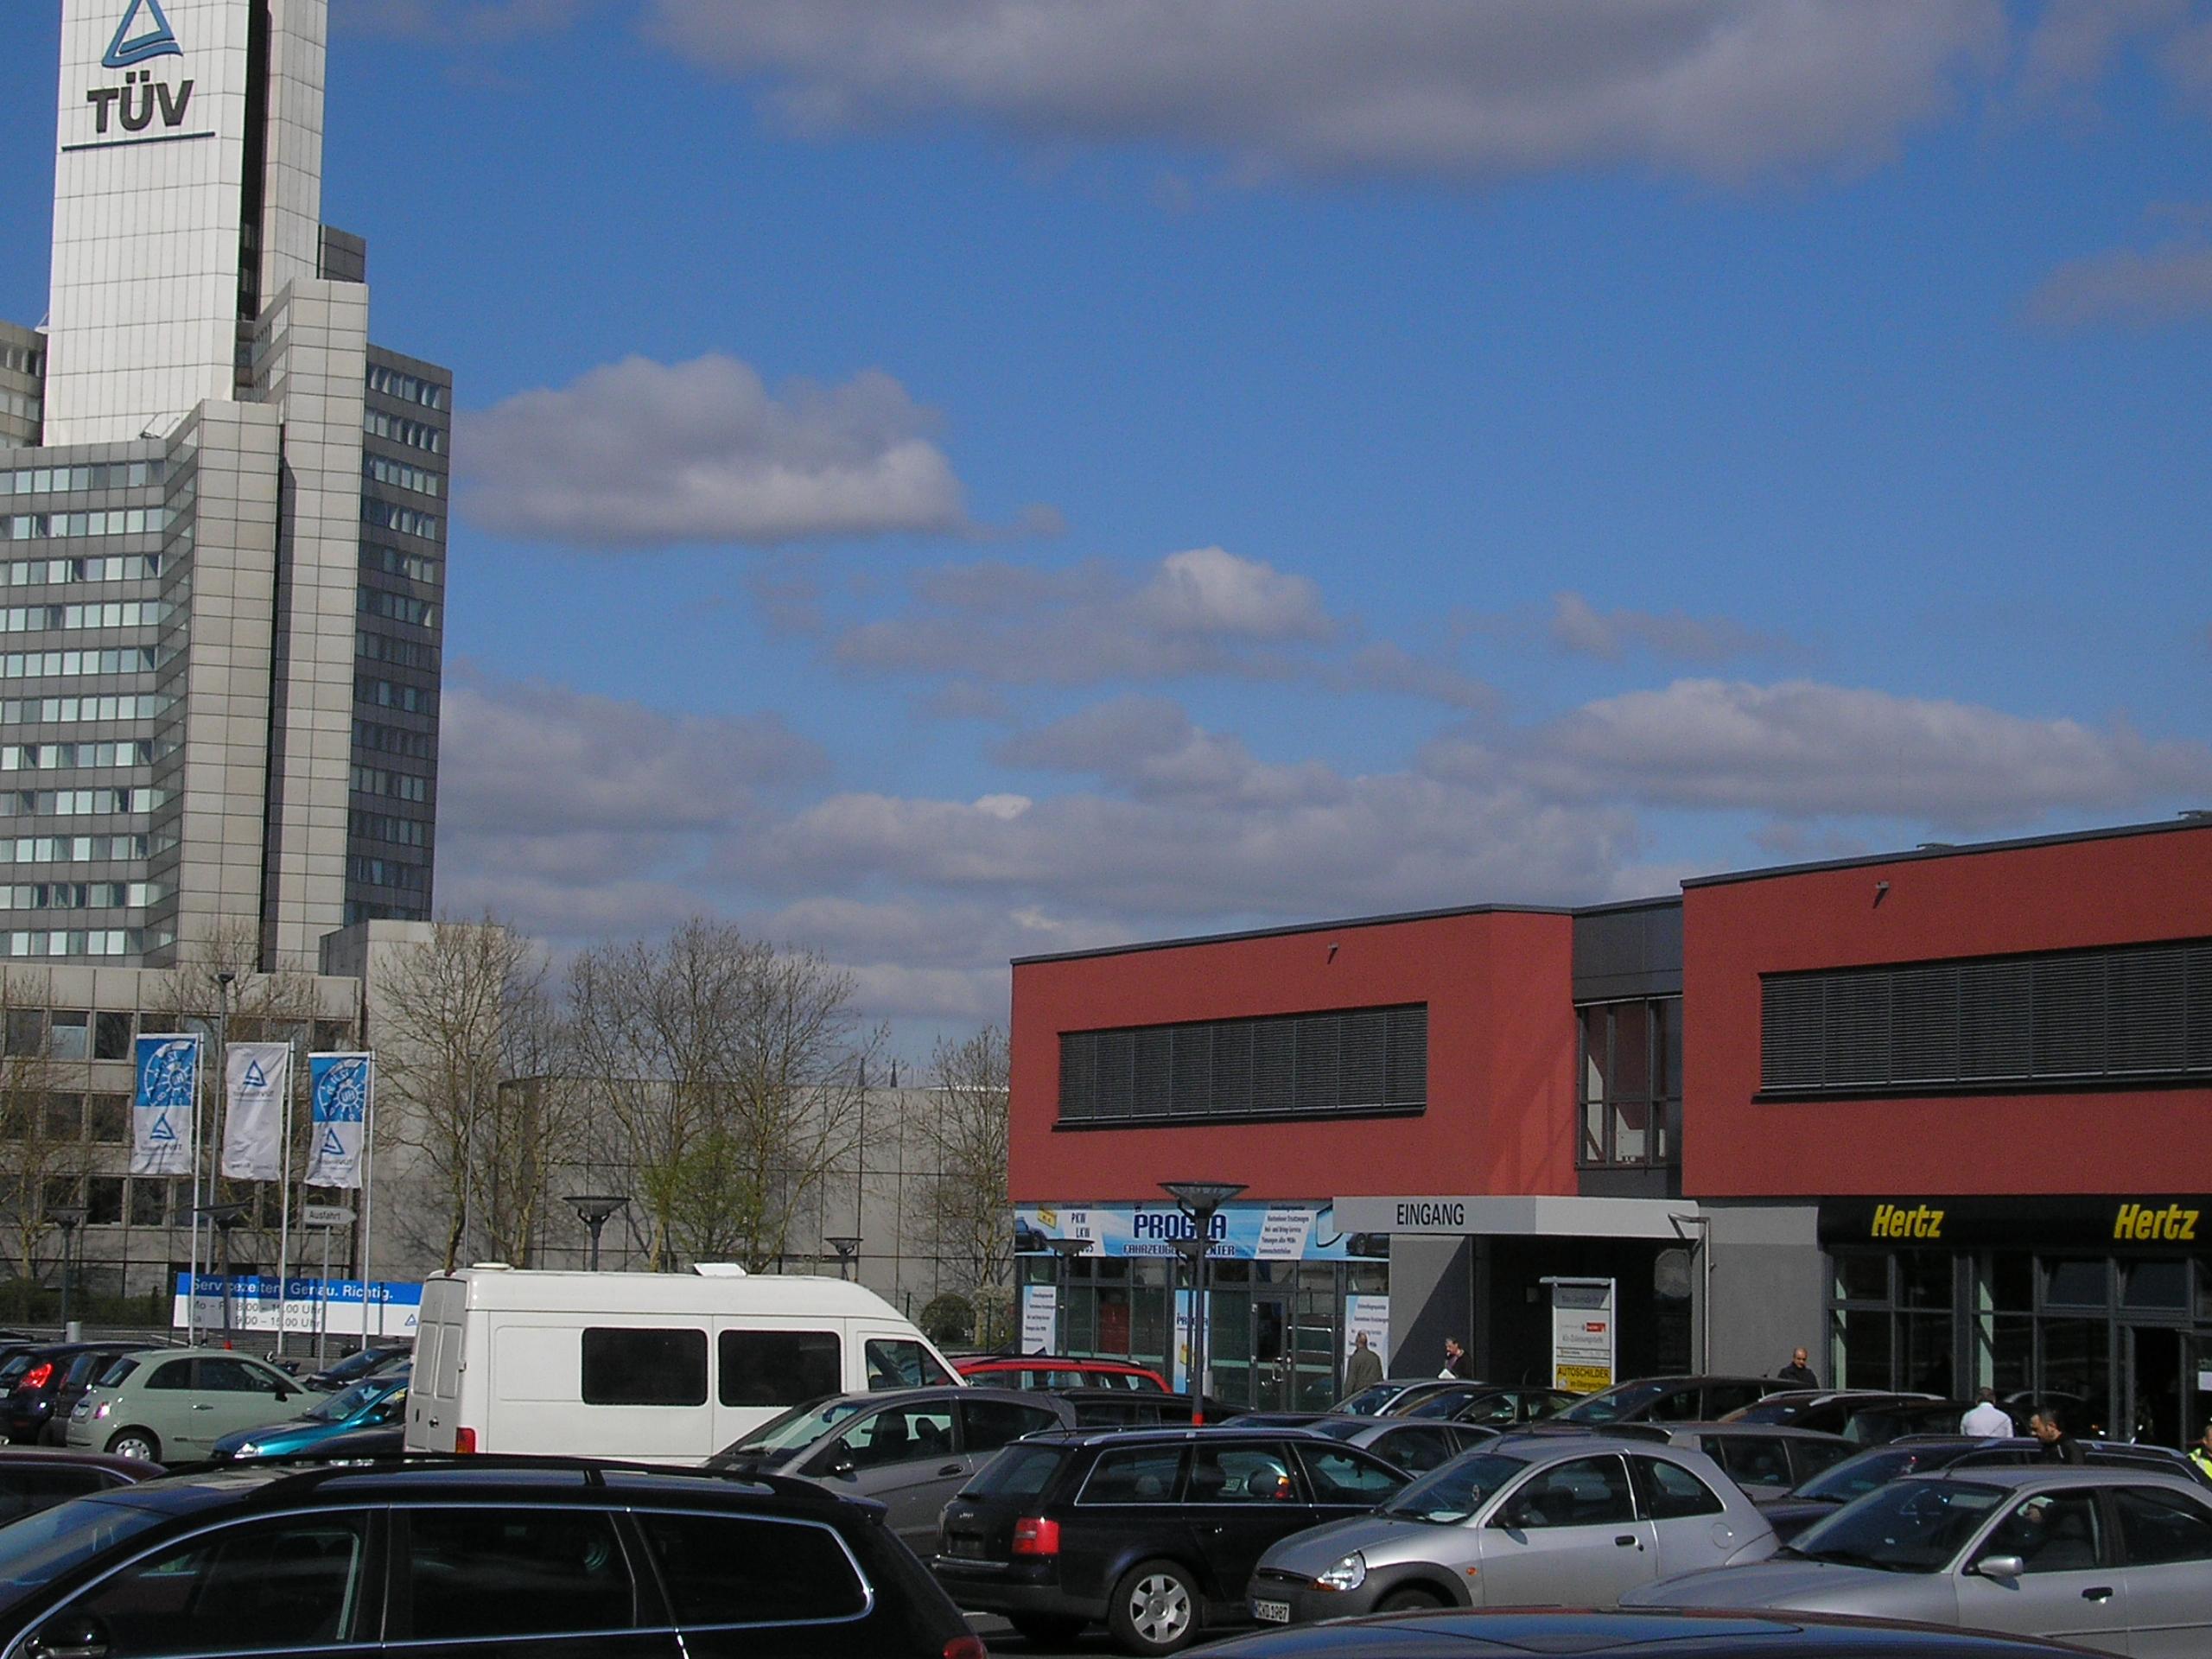 Köln Kfz Zulassung